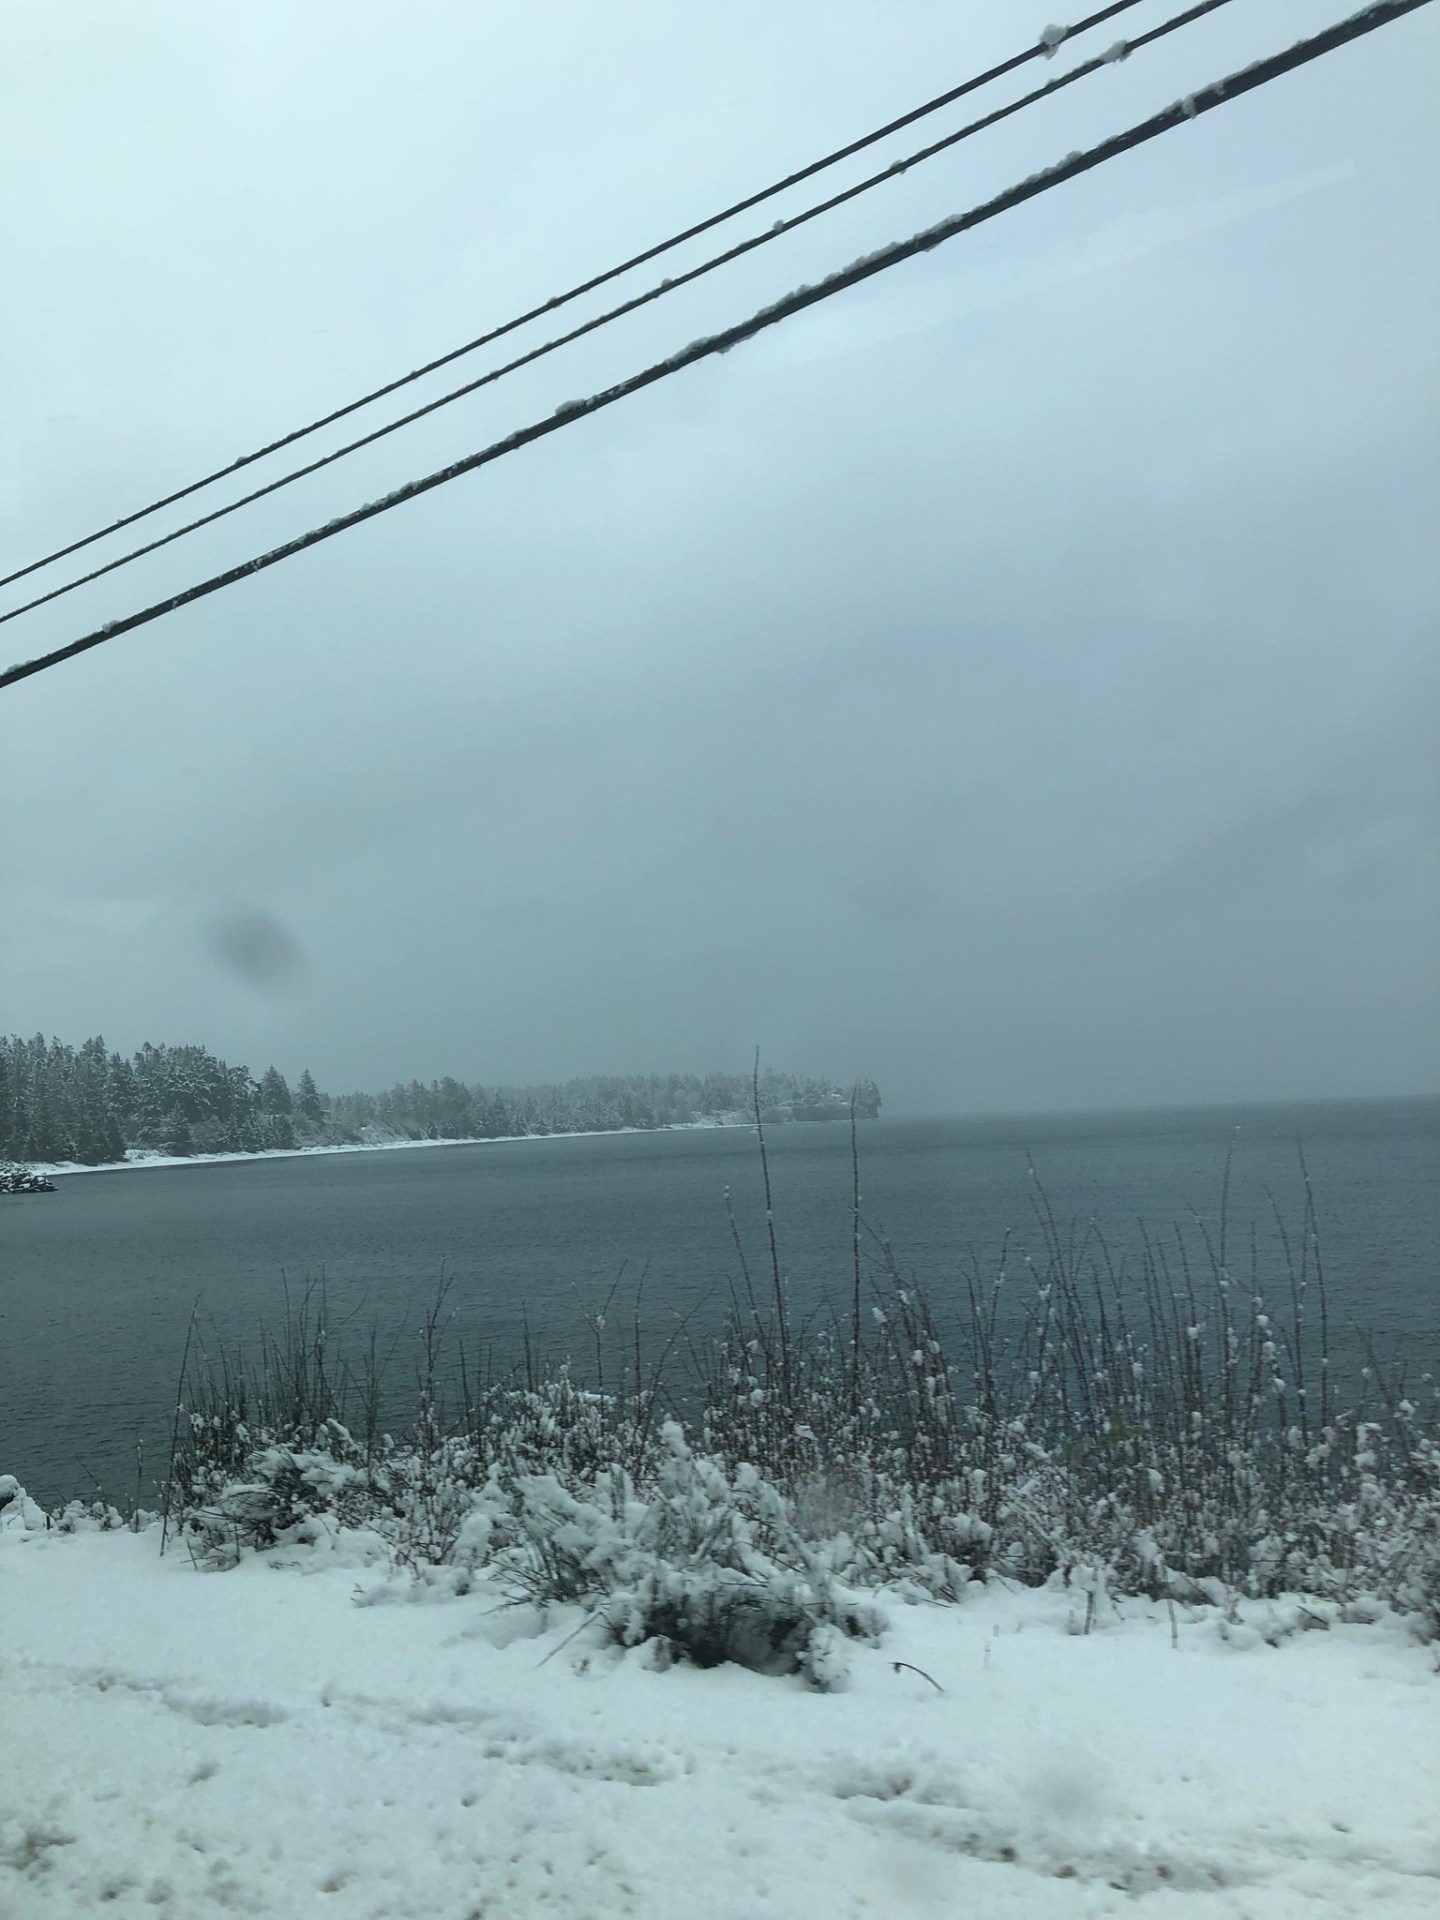 Snowy Port Renfrew in British Columbia